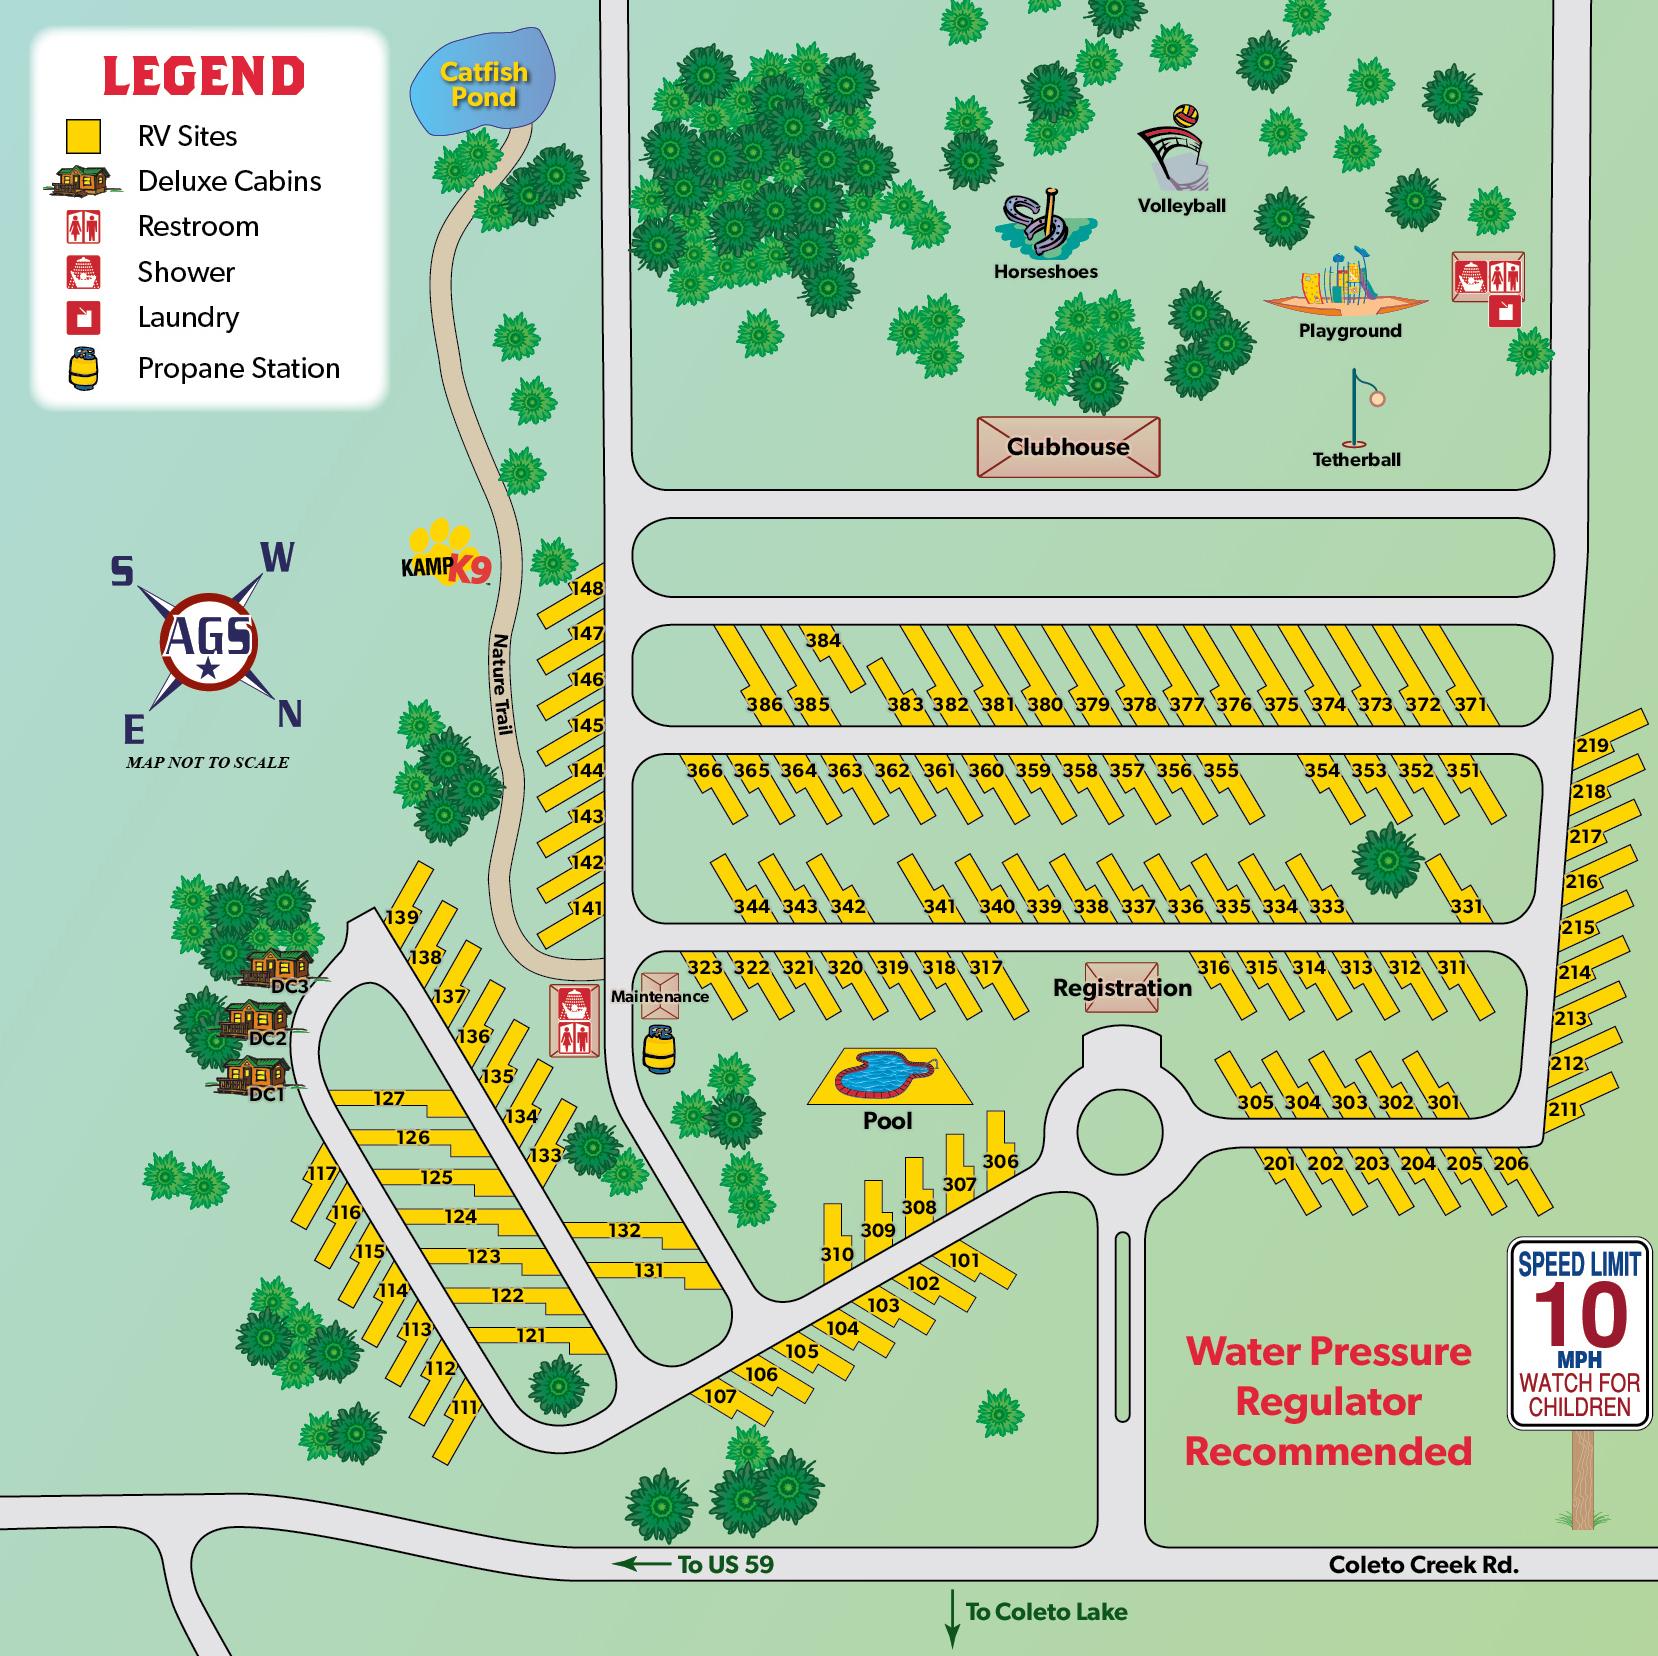 Victoria, Texas Campground | Victoria Coleto Creek Lake Koa - South Texas Rv Parks Map